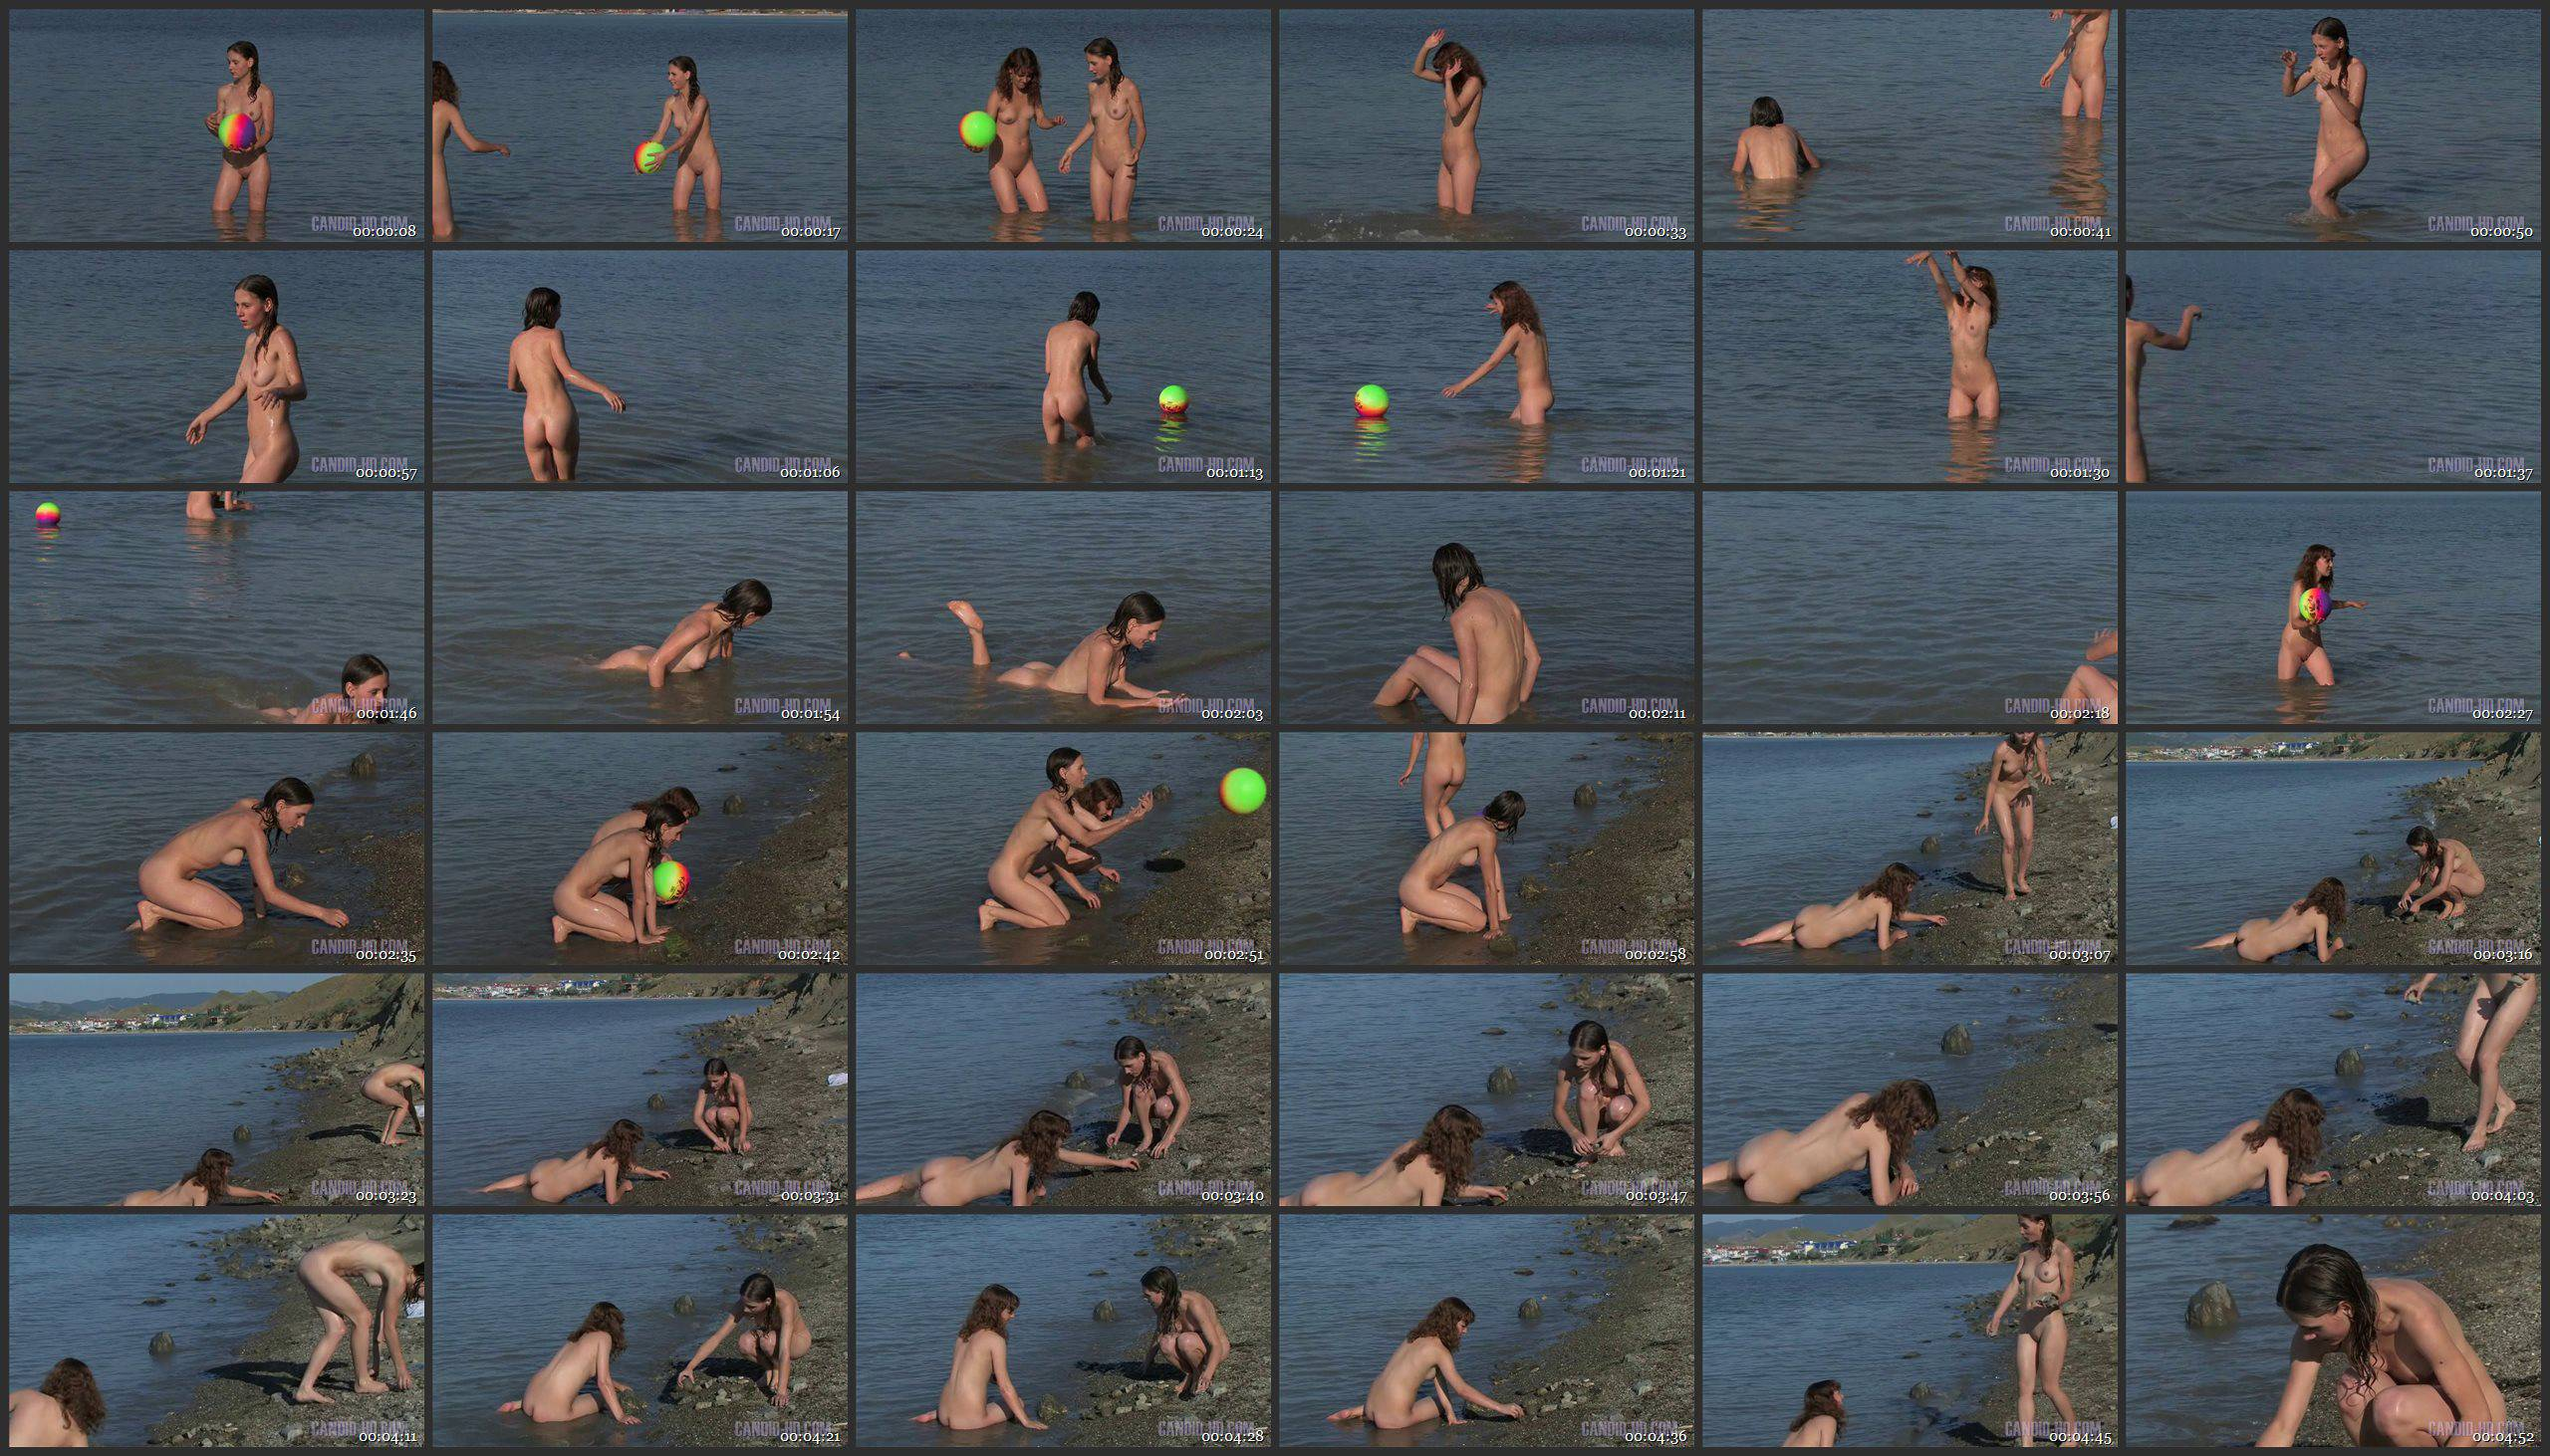 Sisters Idyllic Summer 2 - Thumbnails